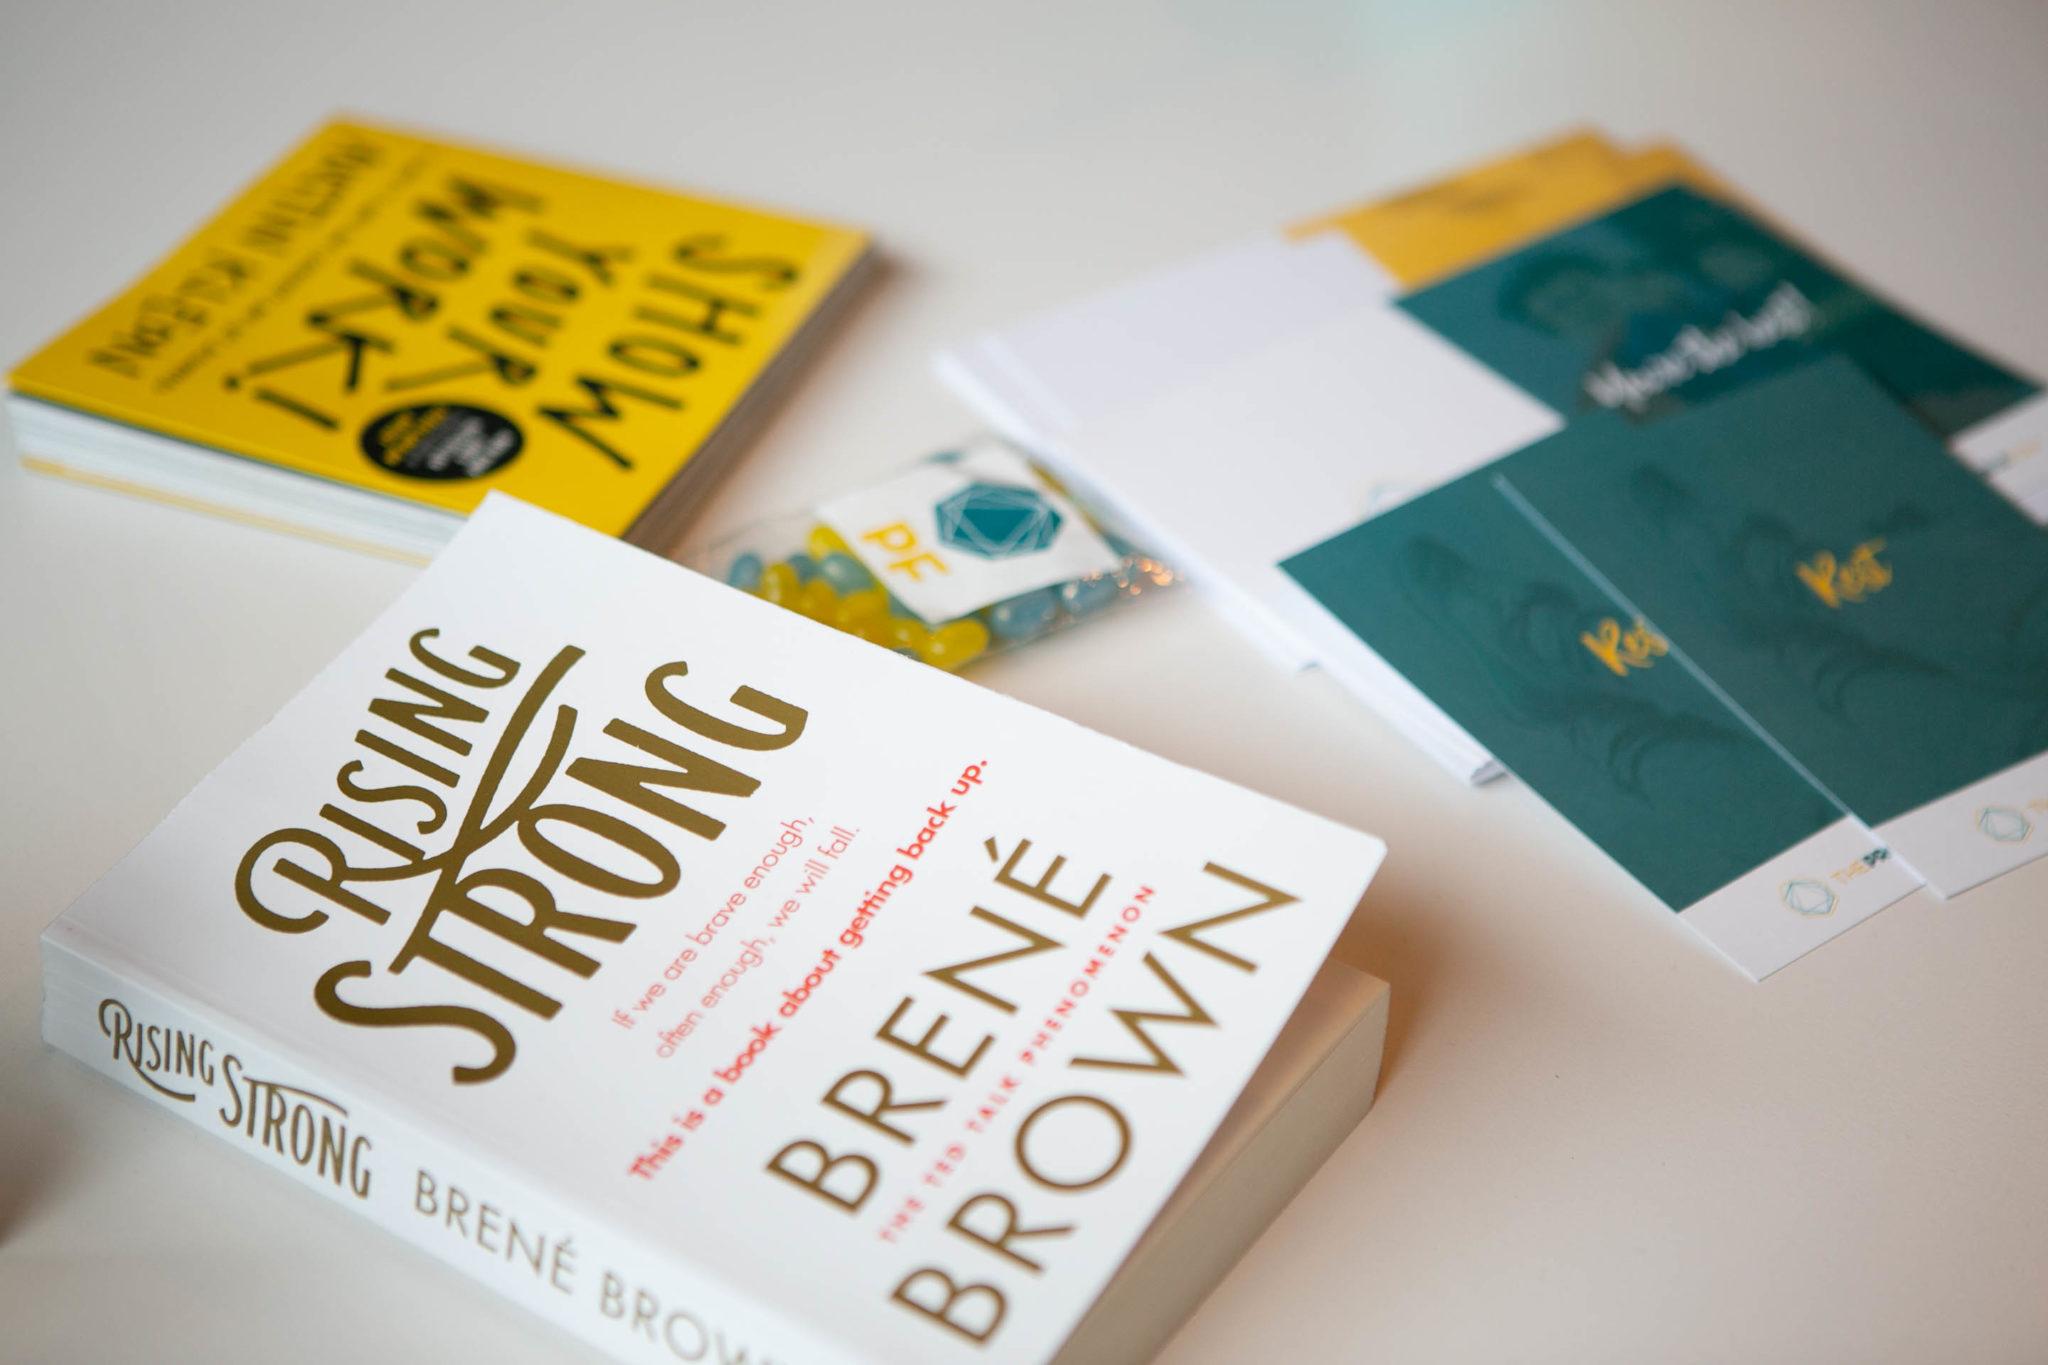 brene brown rising strong book